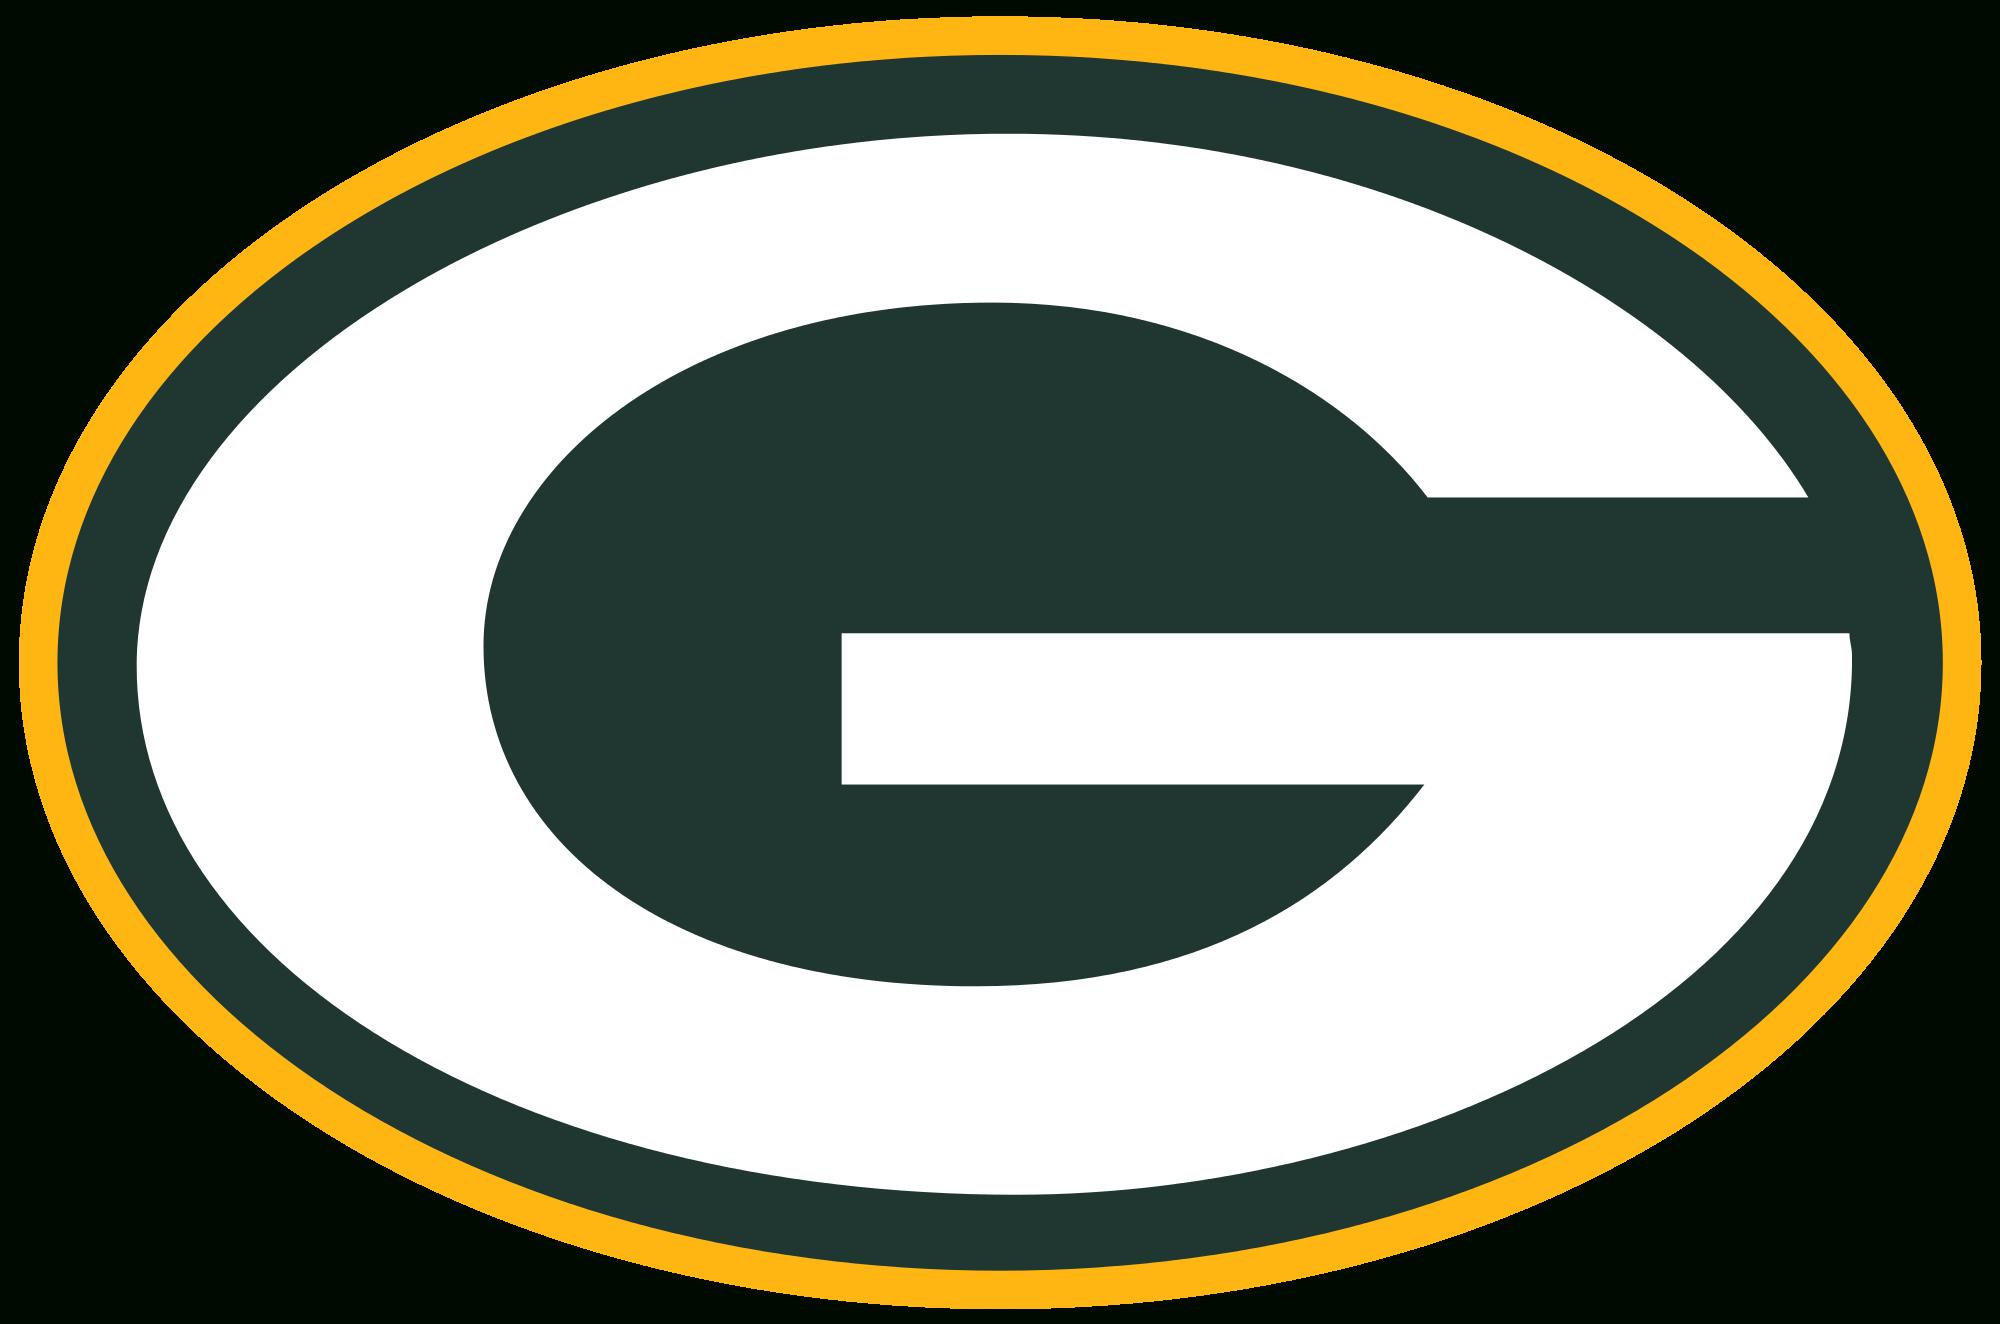 Green Bay Packers Drawing Logo Png Images - Free Printable Green Bay Packers Logo